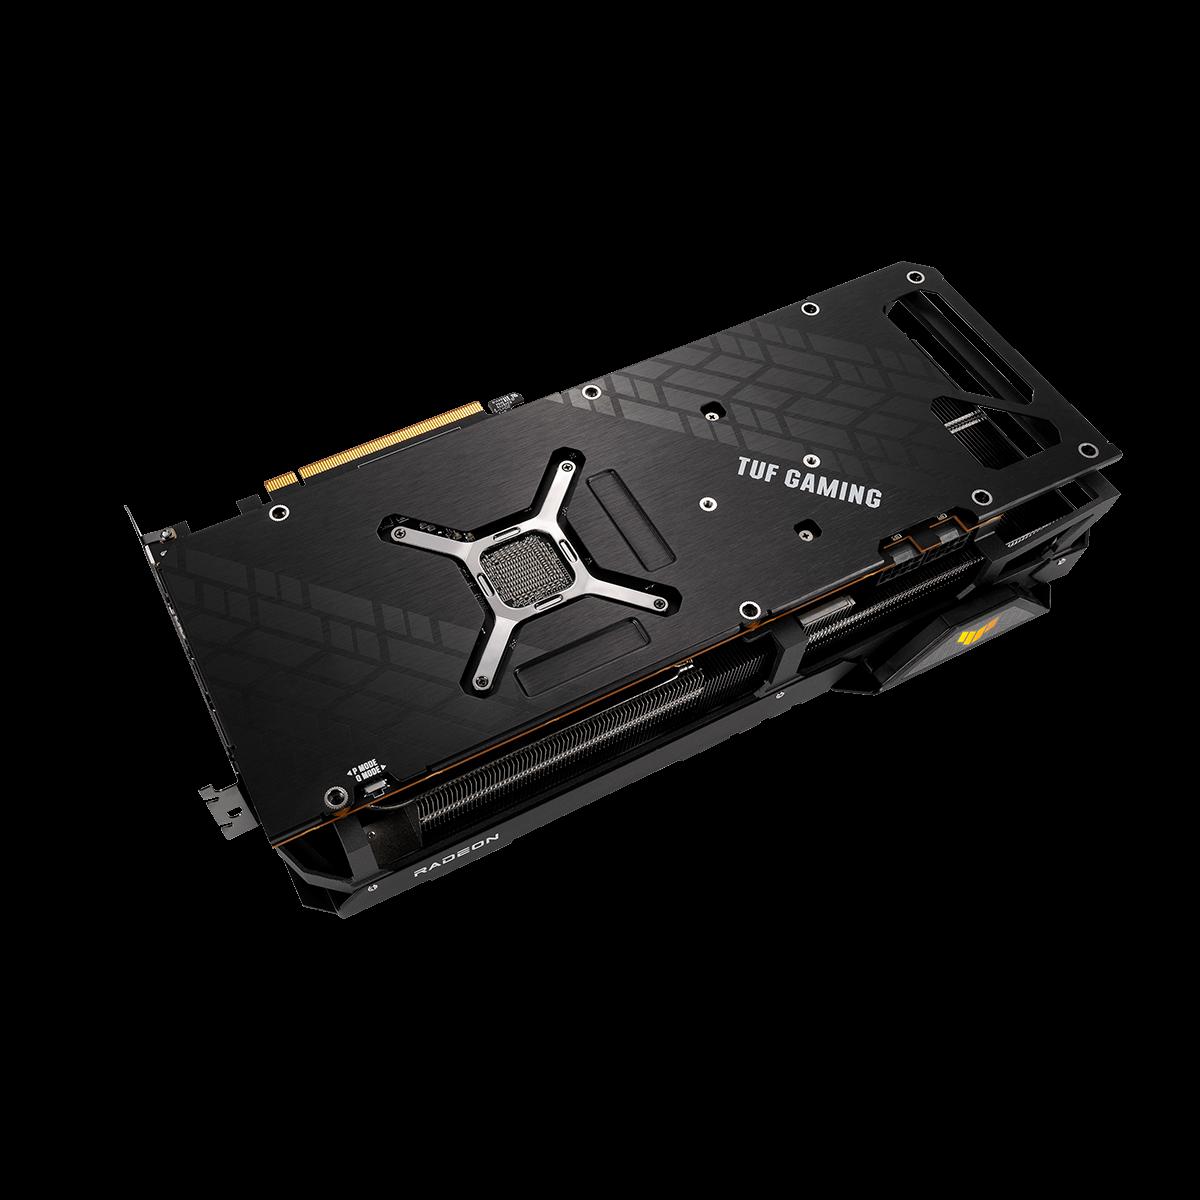 Placa de Vídeo Asus TUF Gaming Radeon RX 6700 XT OC, 12GB, GDDR6, 192bit, TUF-RX6700XT-O12G-GAMING